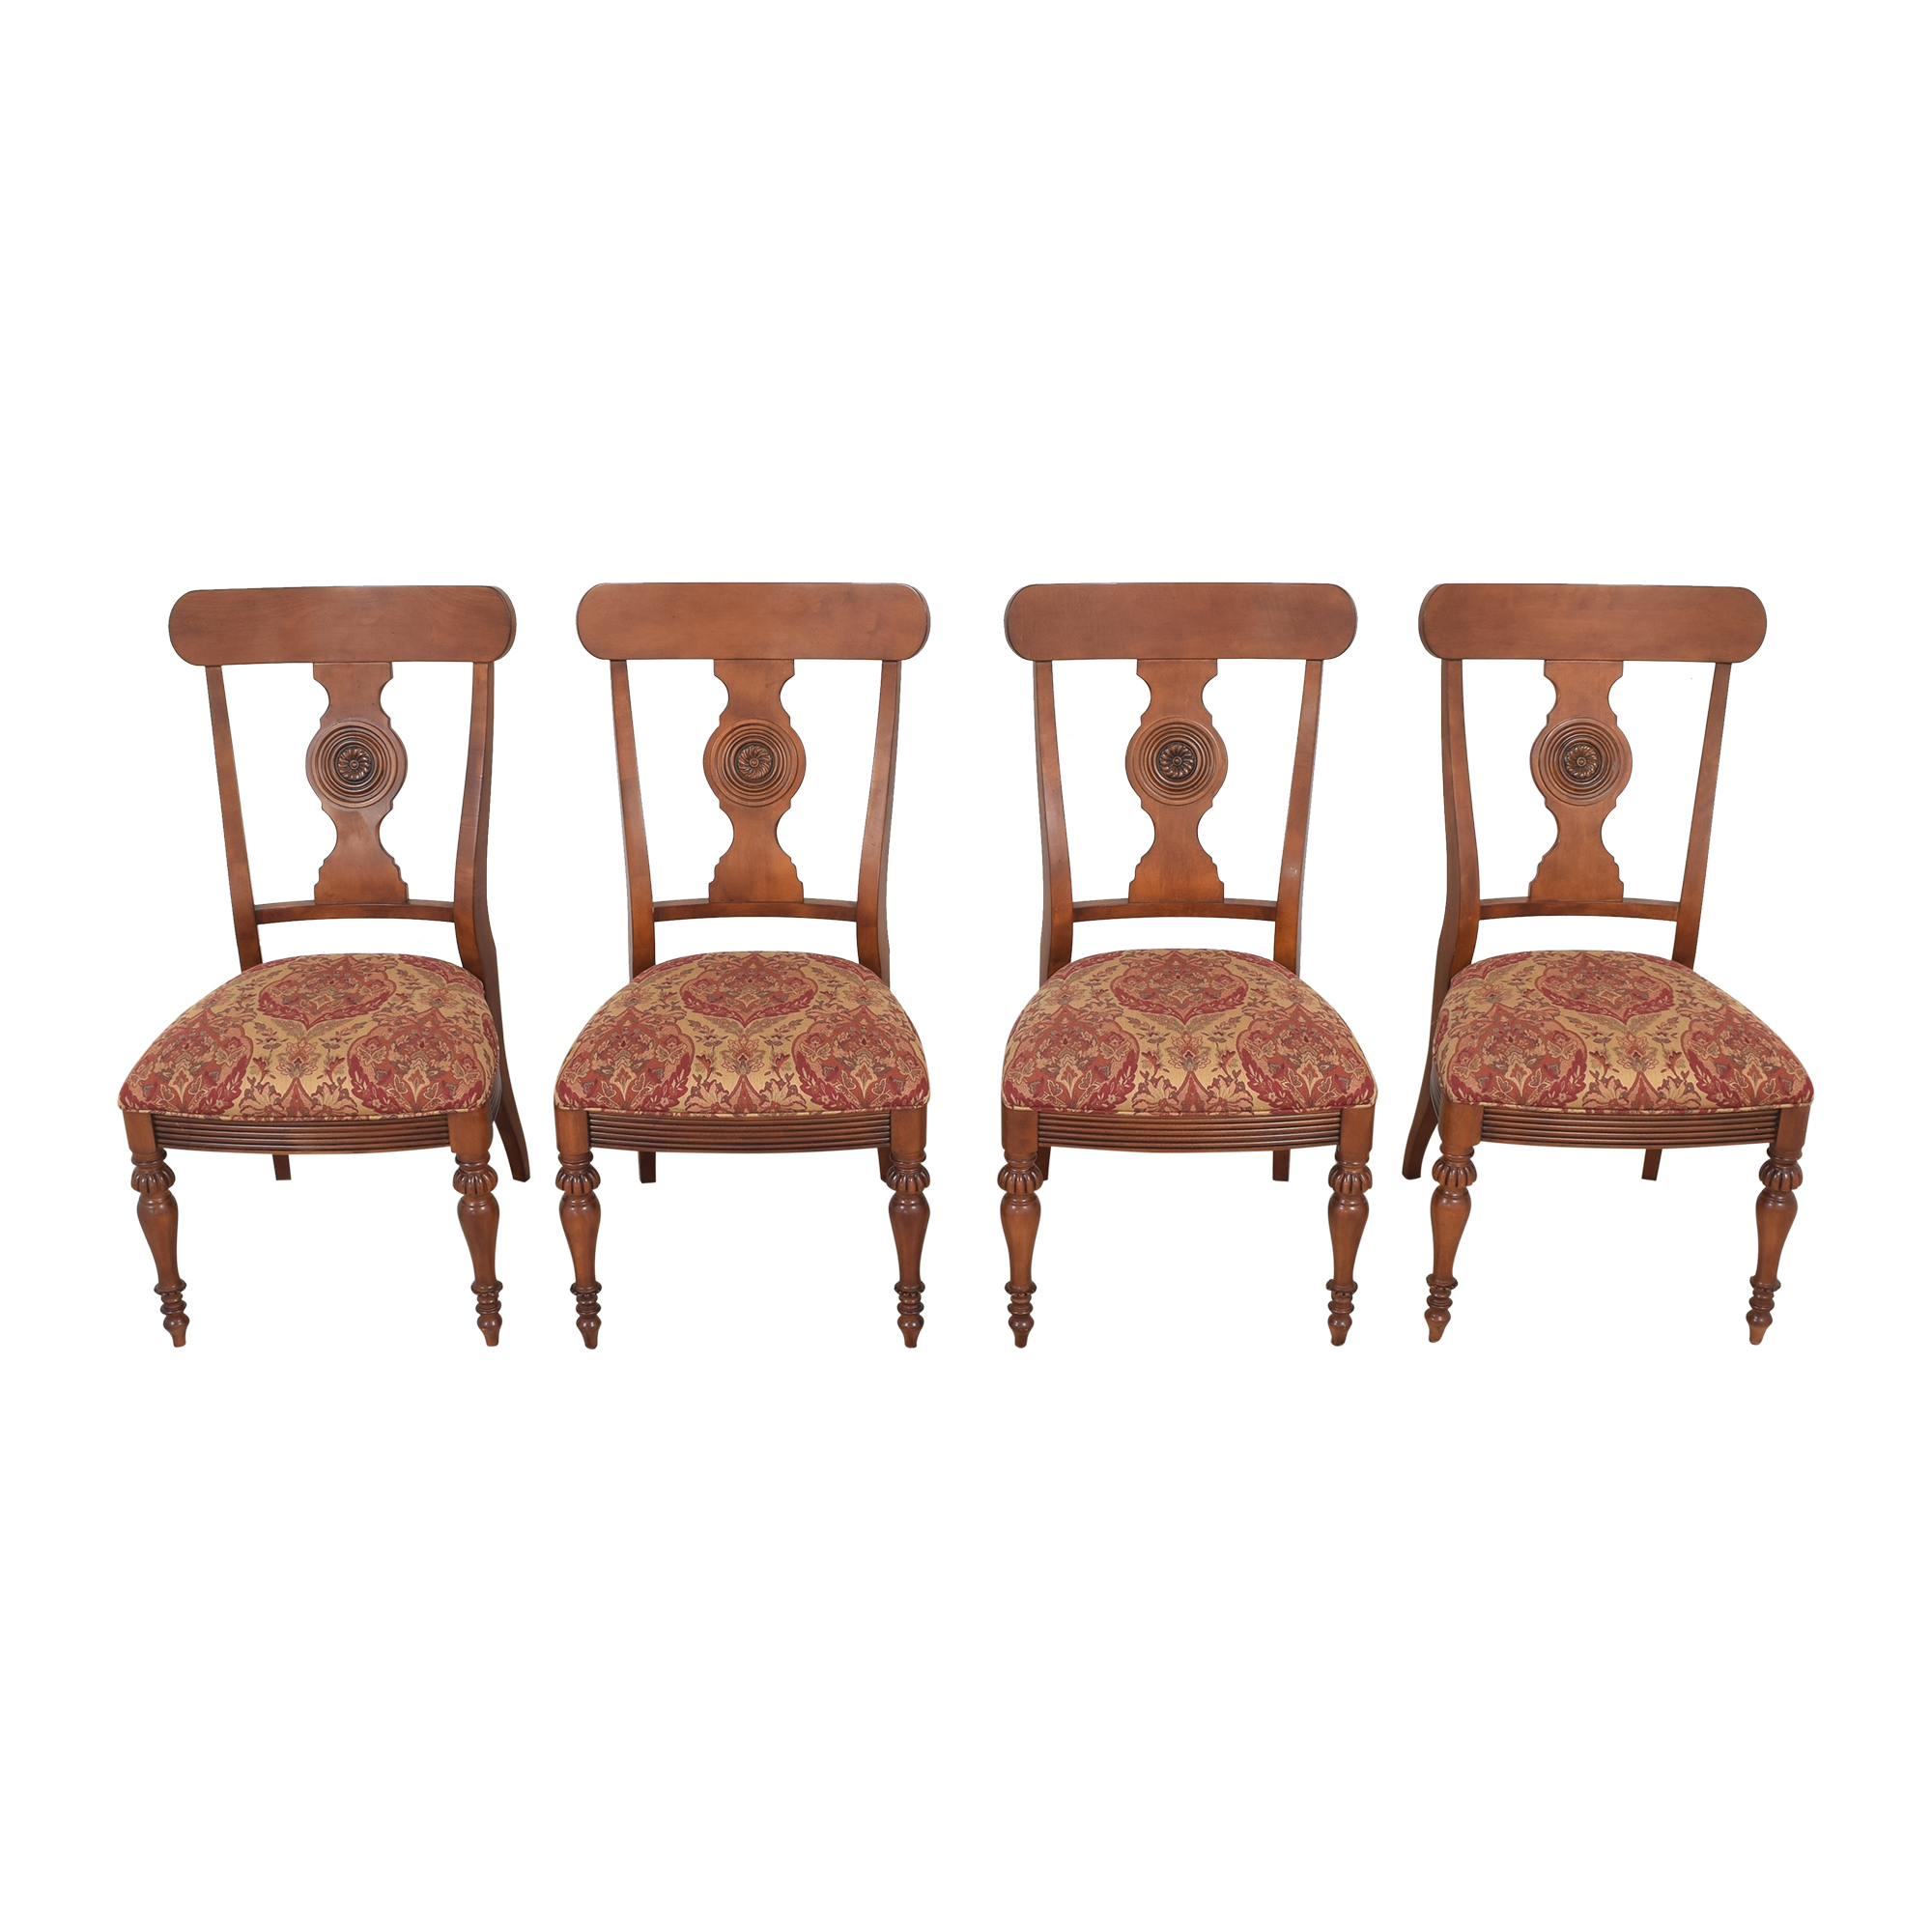 Ethan Allen Ethan Allen British Classic Splatback Dining Chairs ct